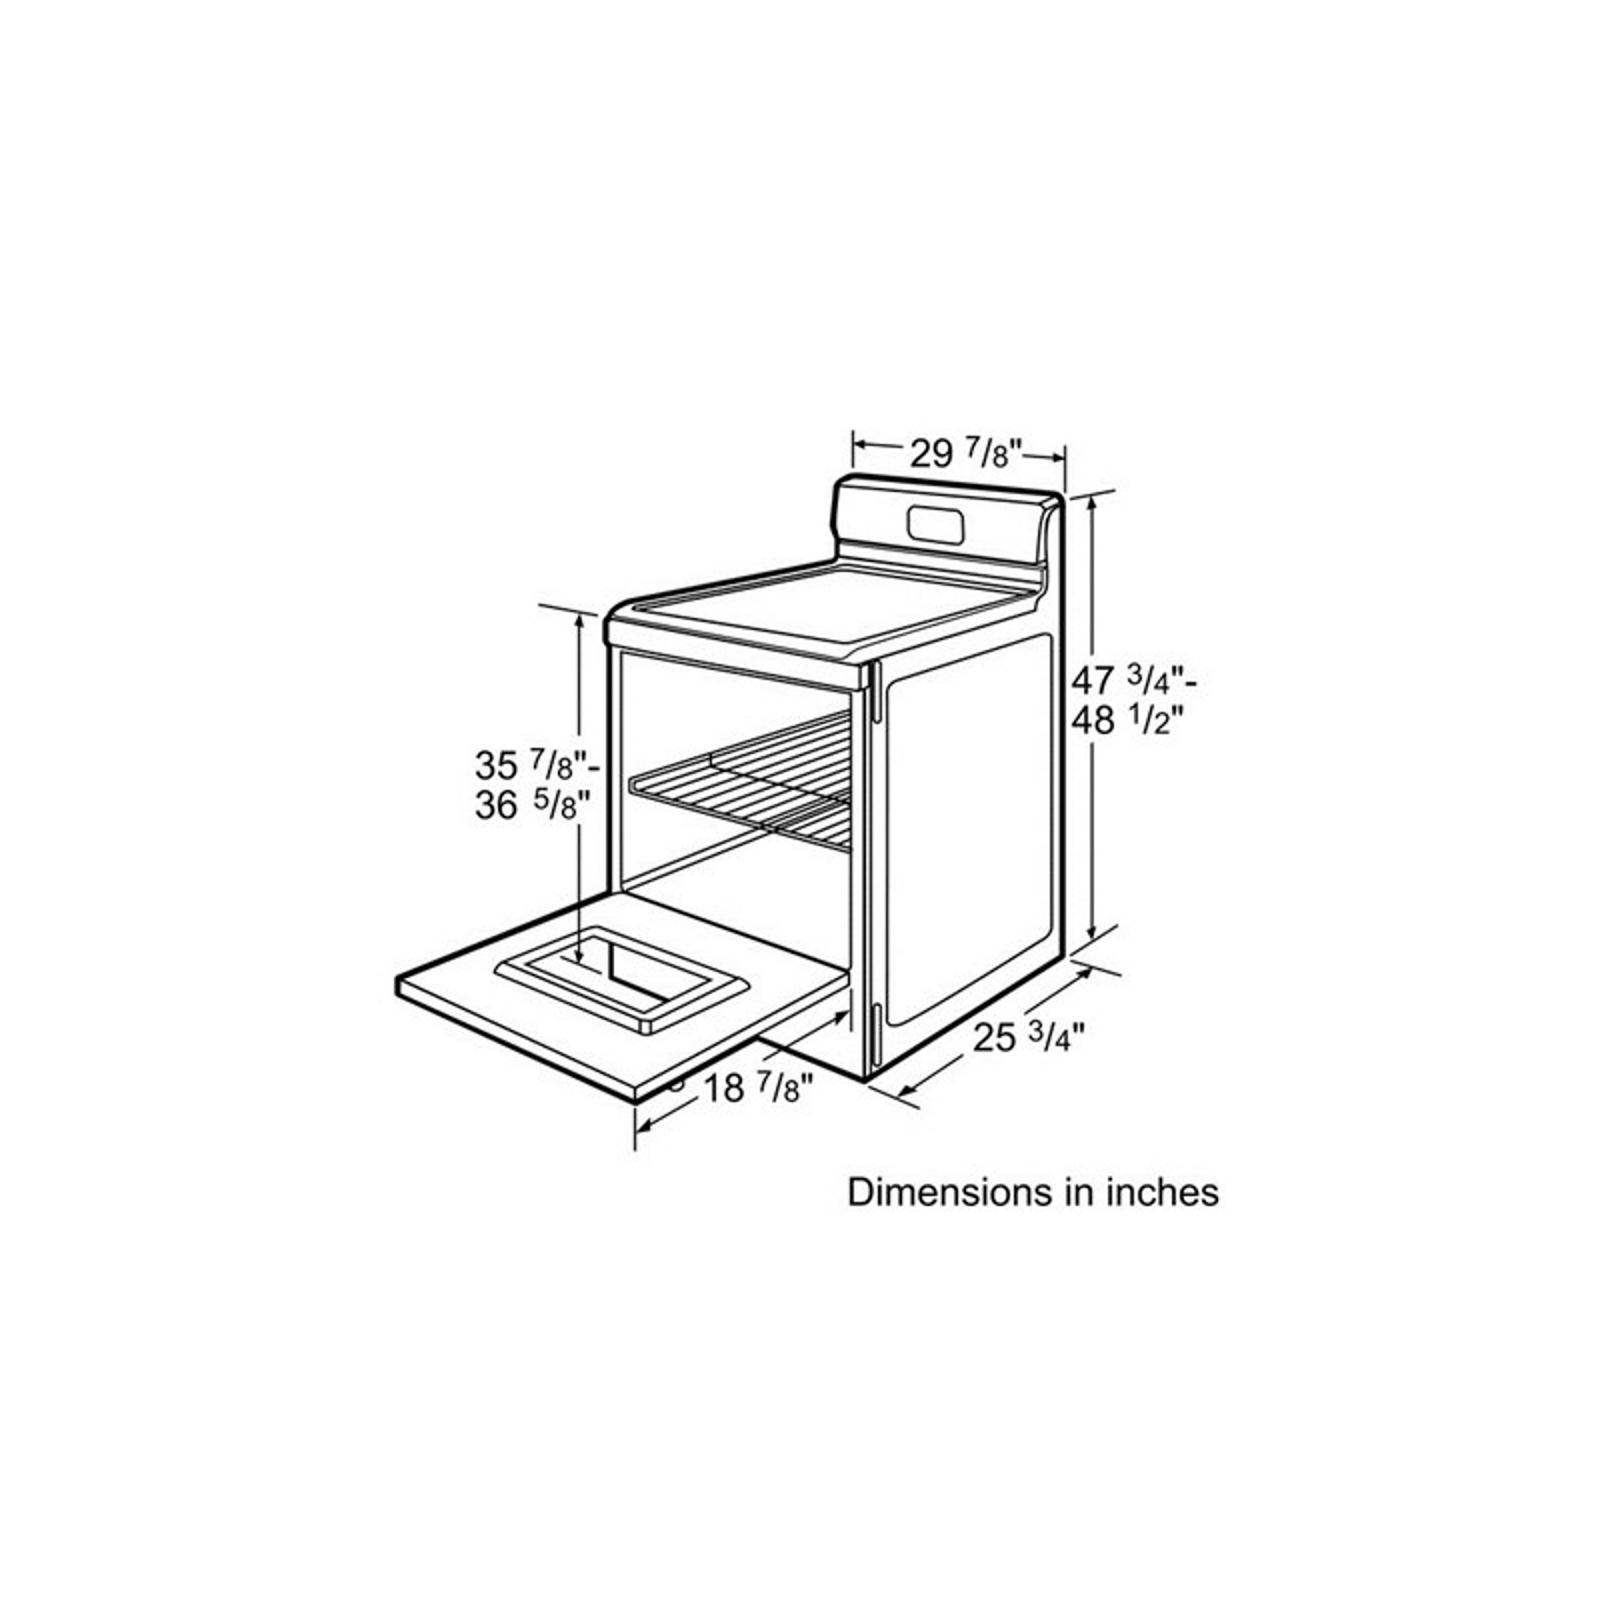 medium resolution of bosch 5 4 cu ft freestanding electric range sears craftsman riding mower wiring diagram bosch 5